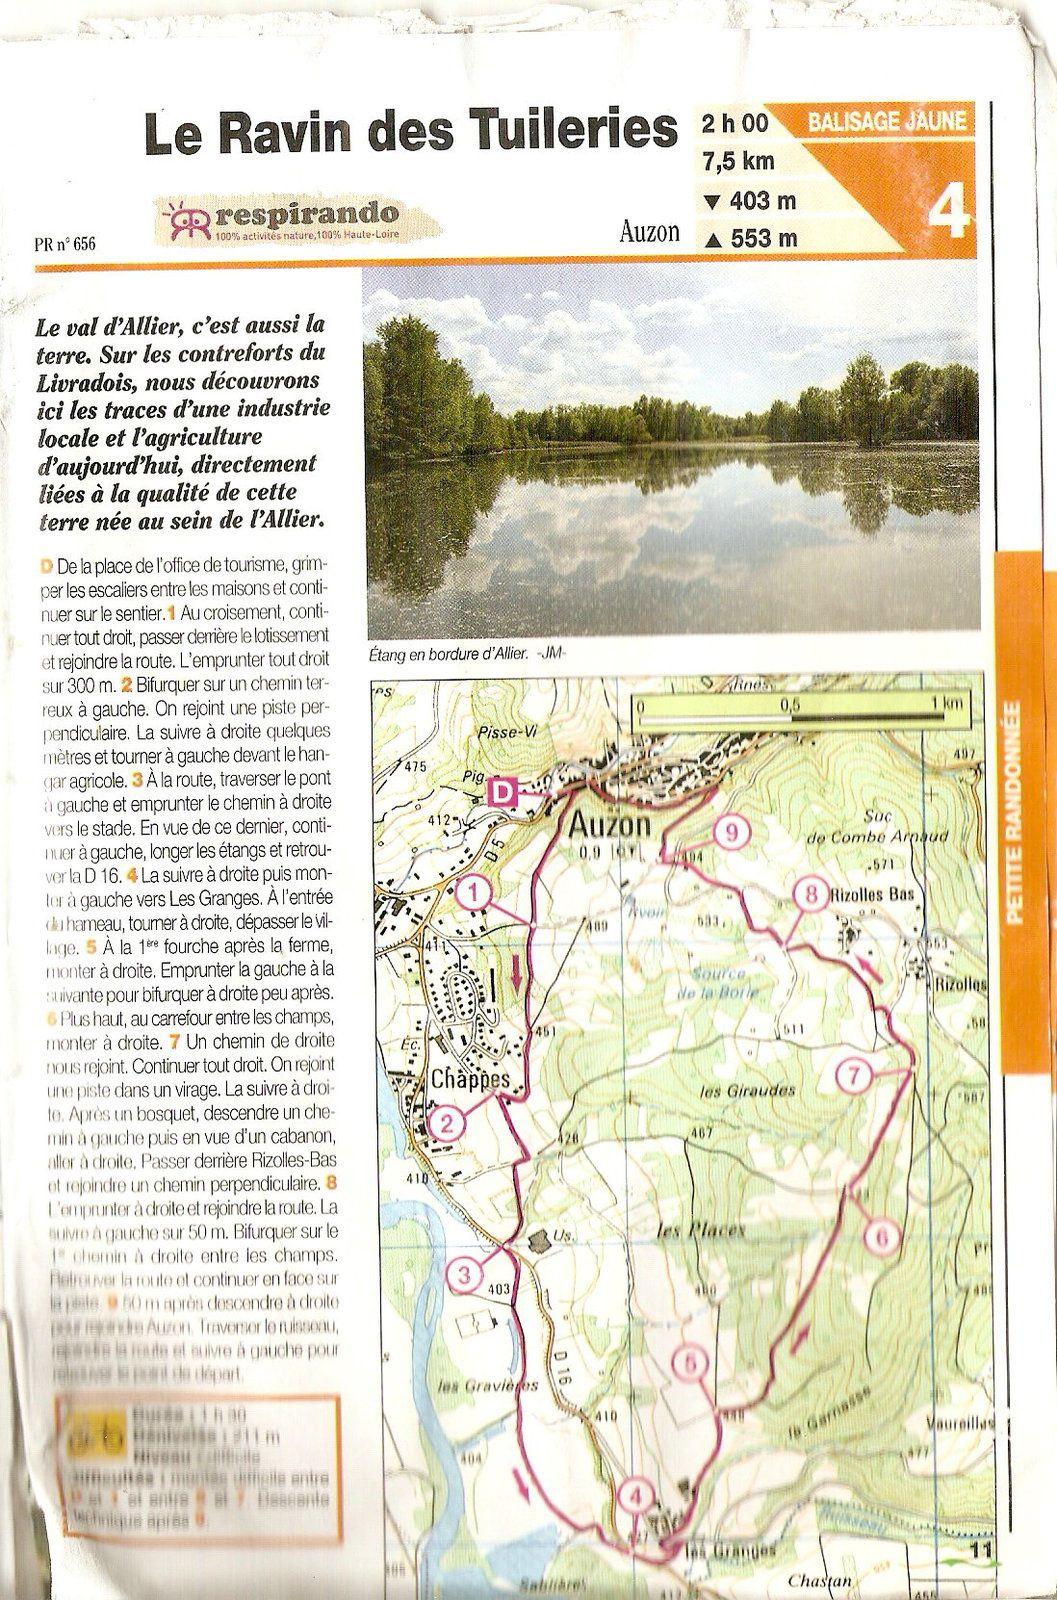 Ravin des Tuileries